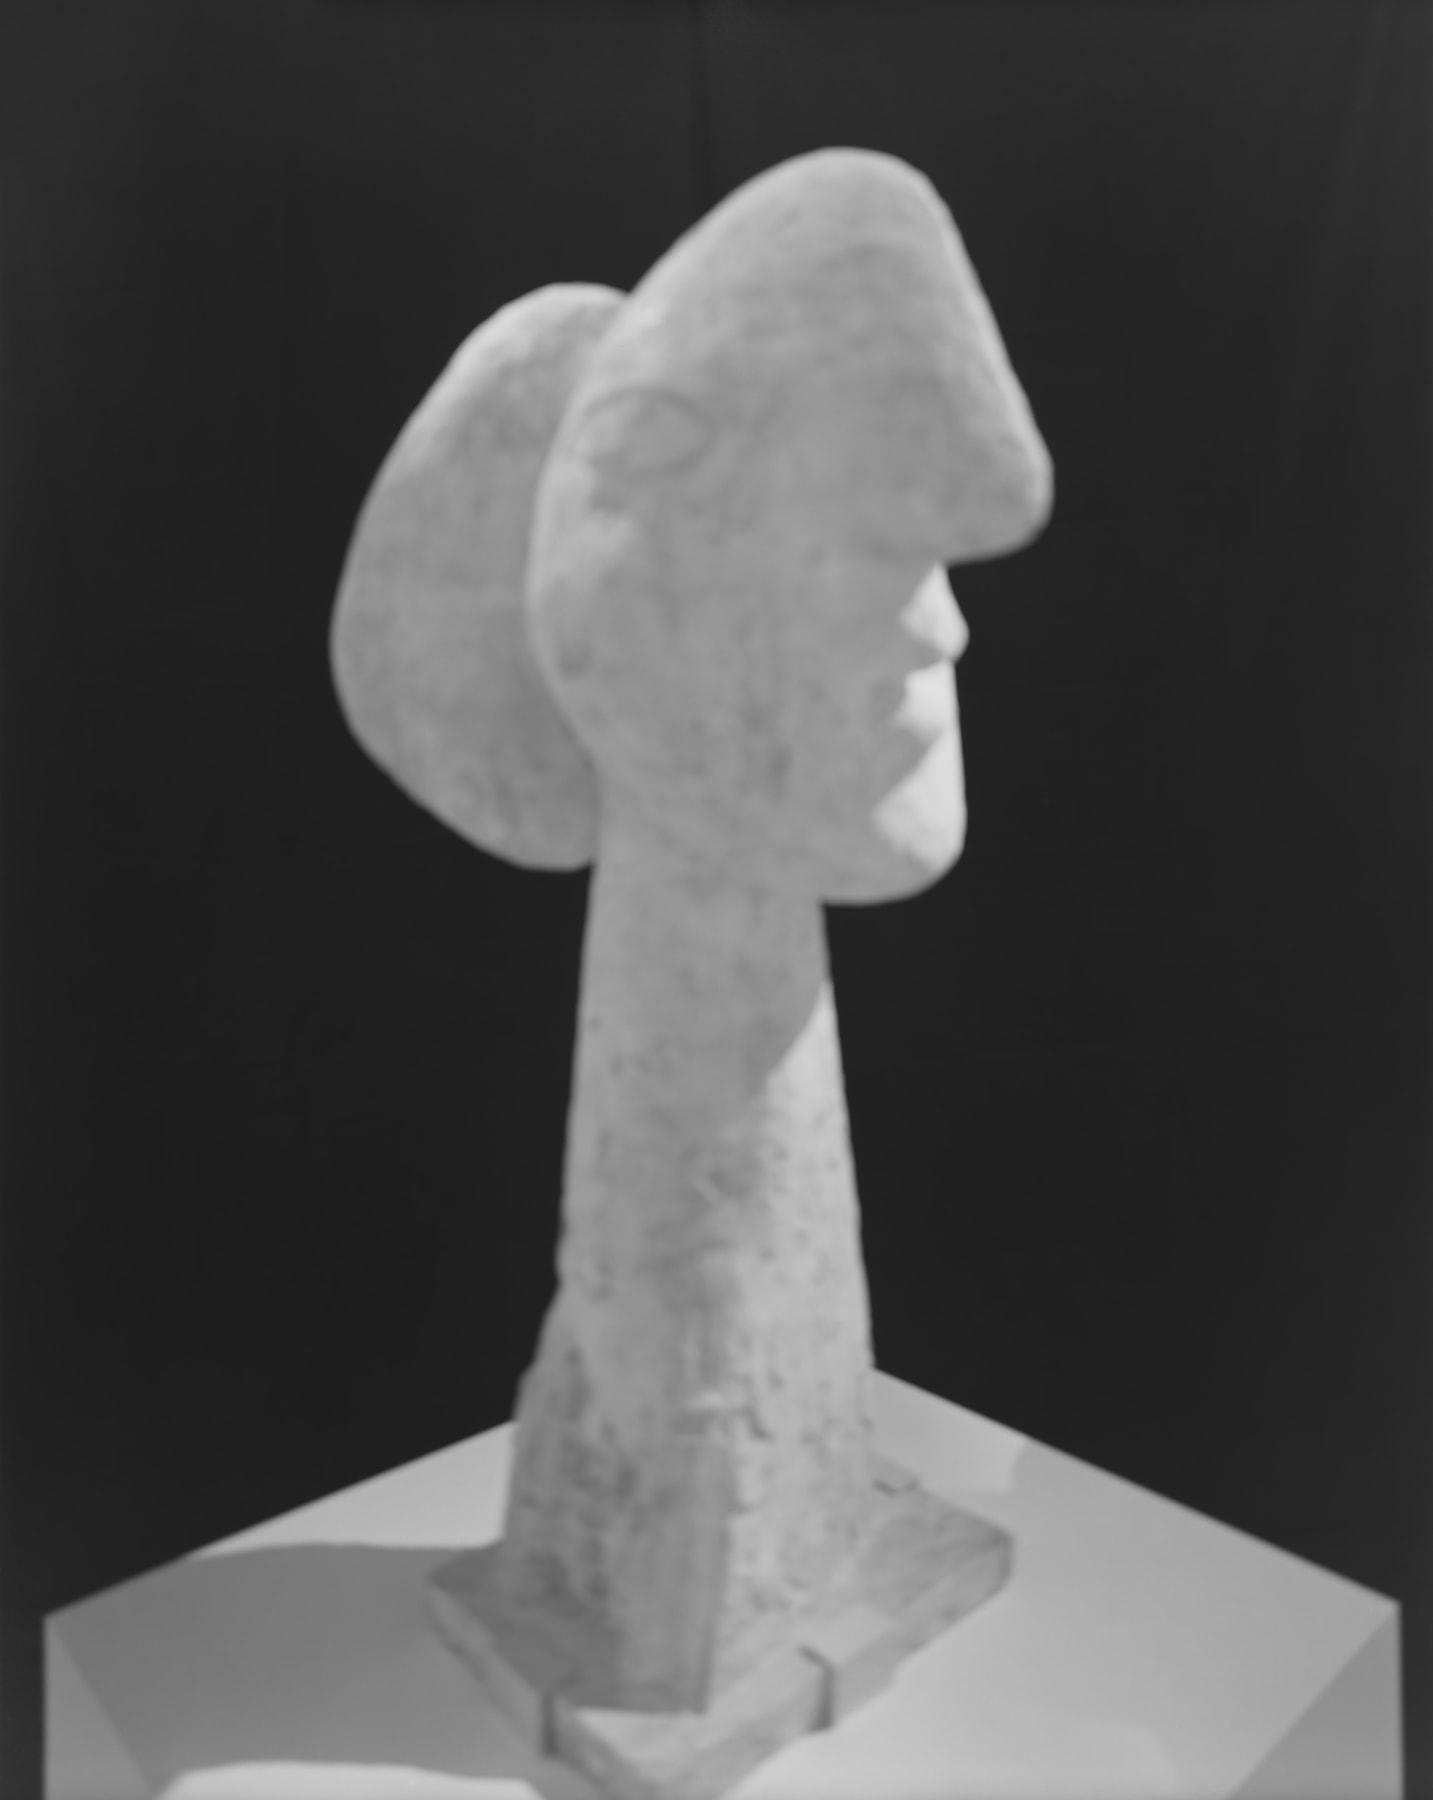 Hiroshi Sugimoto, Past Presence 026, Head of a Woman, Pablo Picasso, 2014